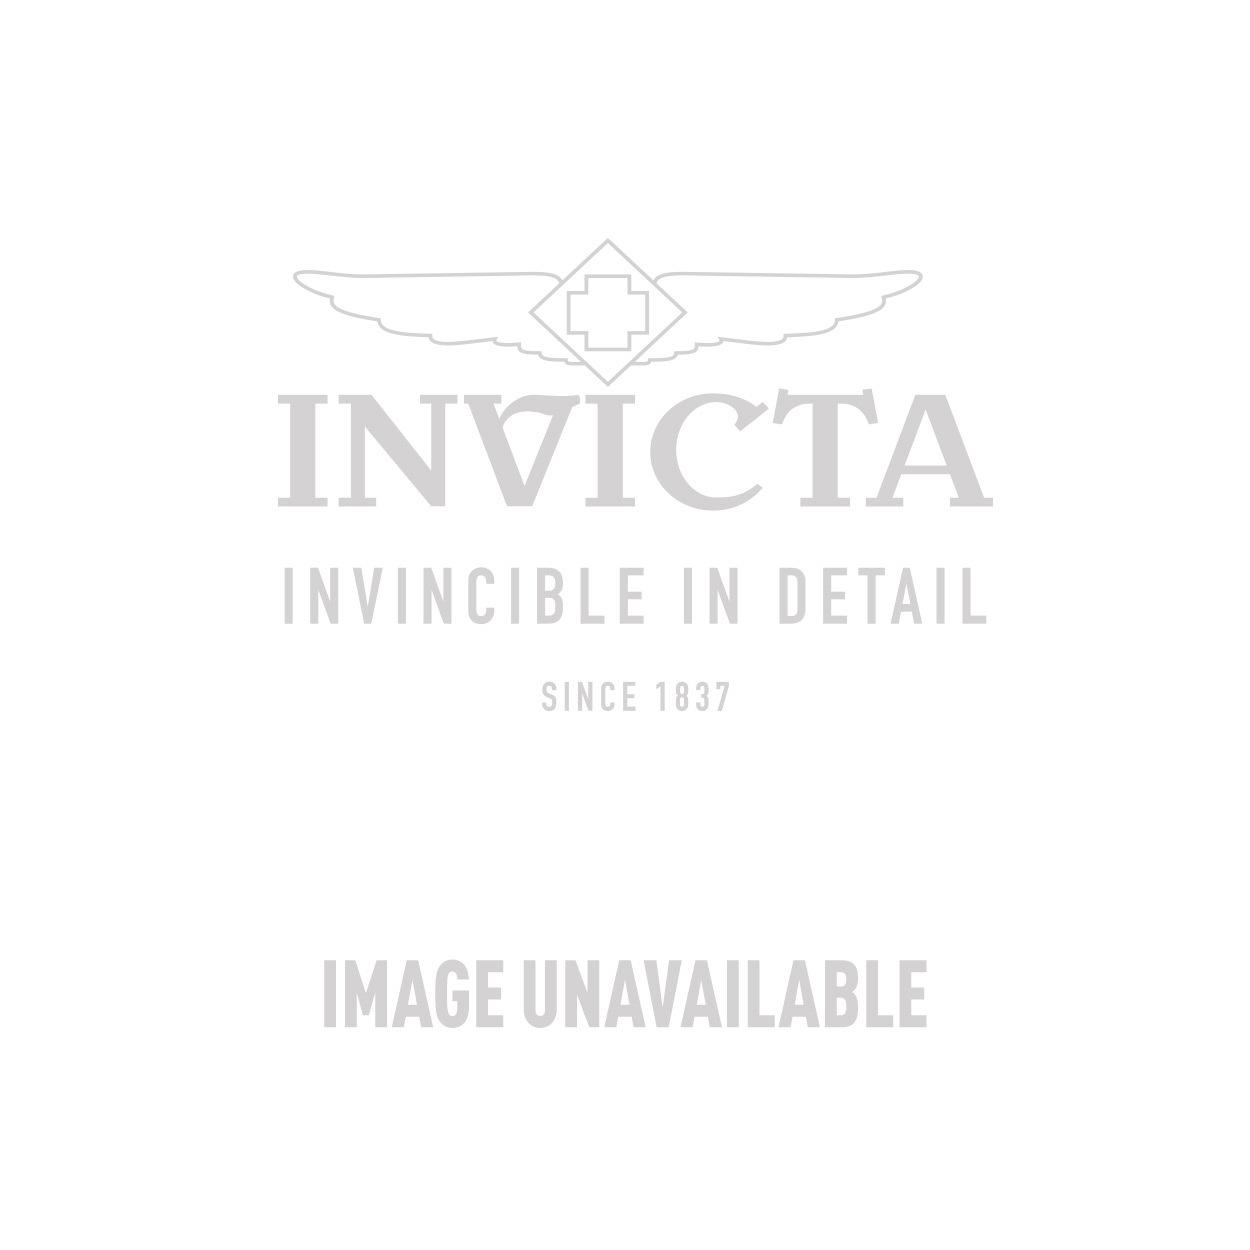 Invicta Subaqua Quartz Watch - Black case with Black tone Stainless Steel  band - Model 18997